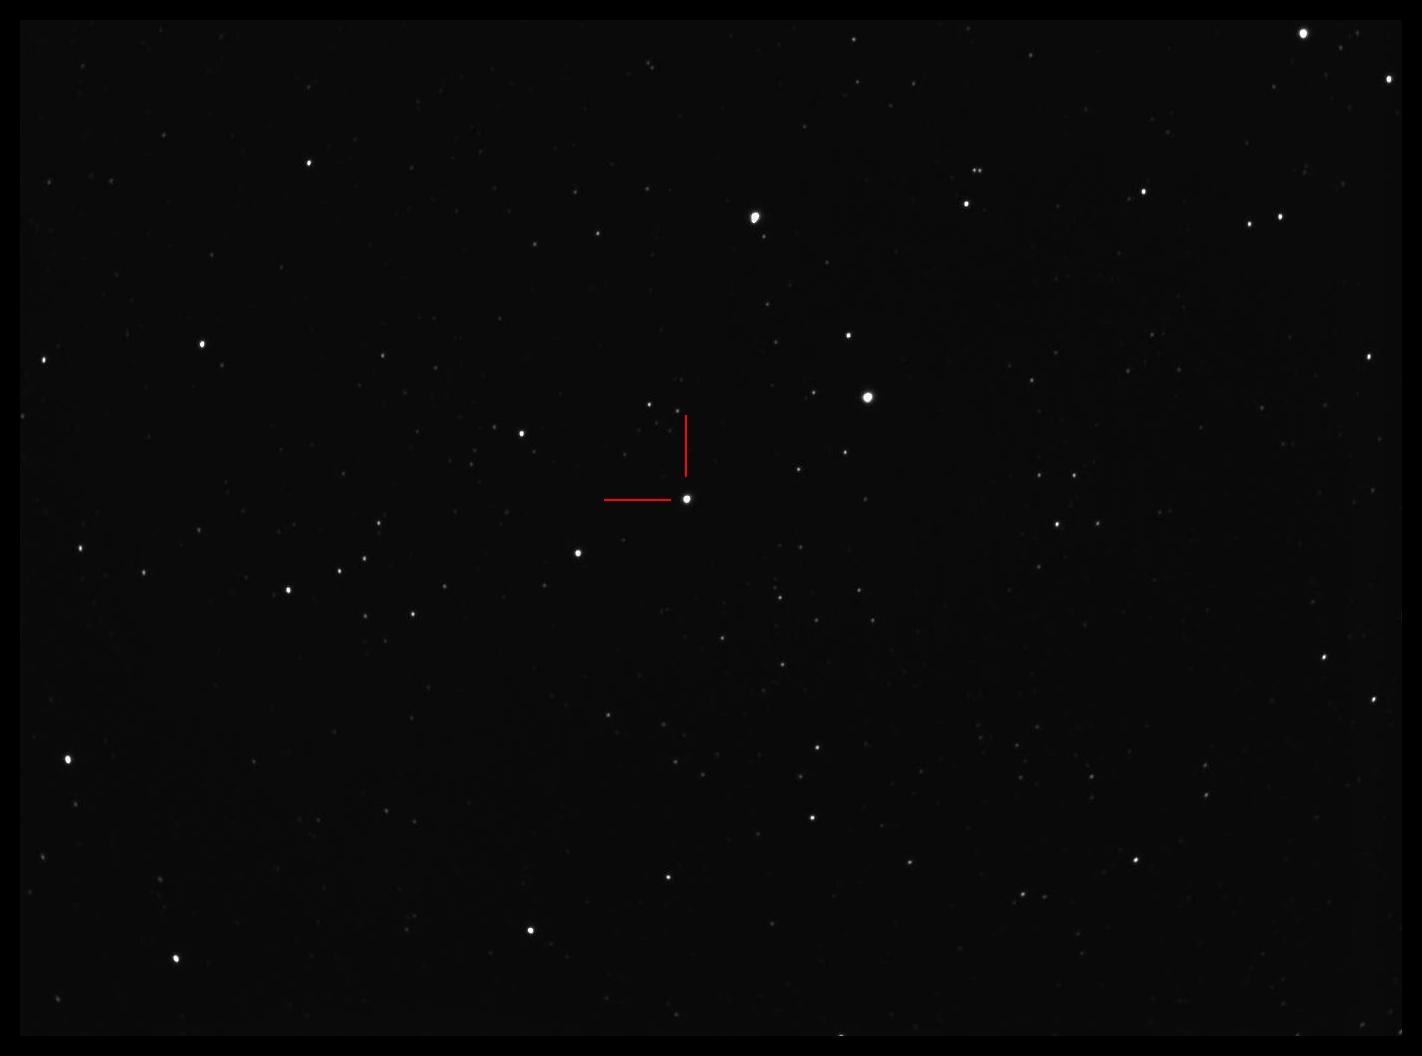 XO-3b uchwycona w trakcie ingressu egzoplanety